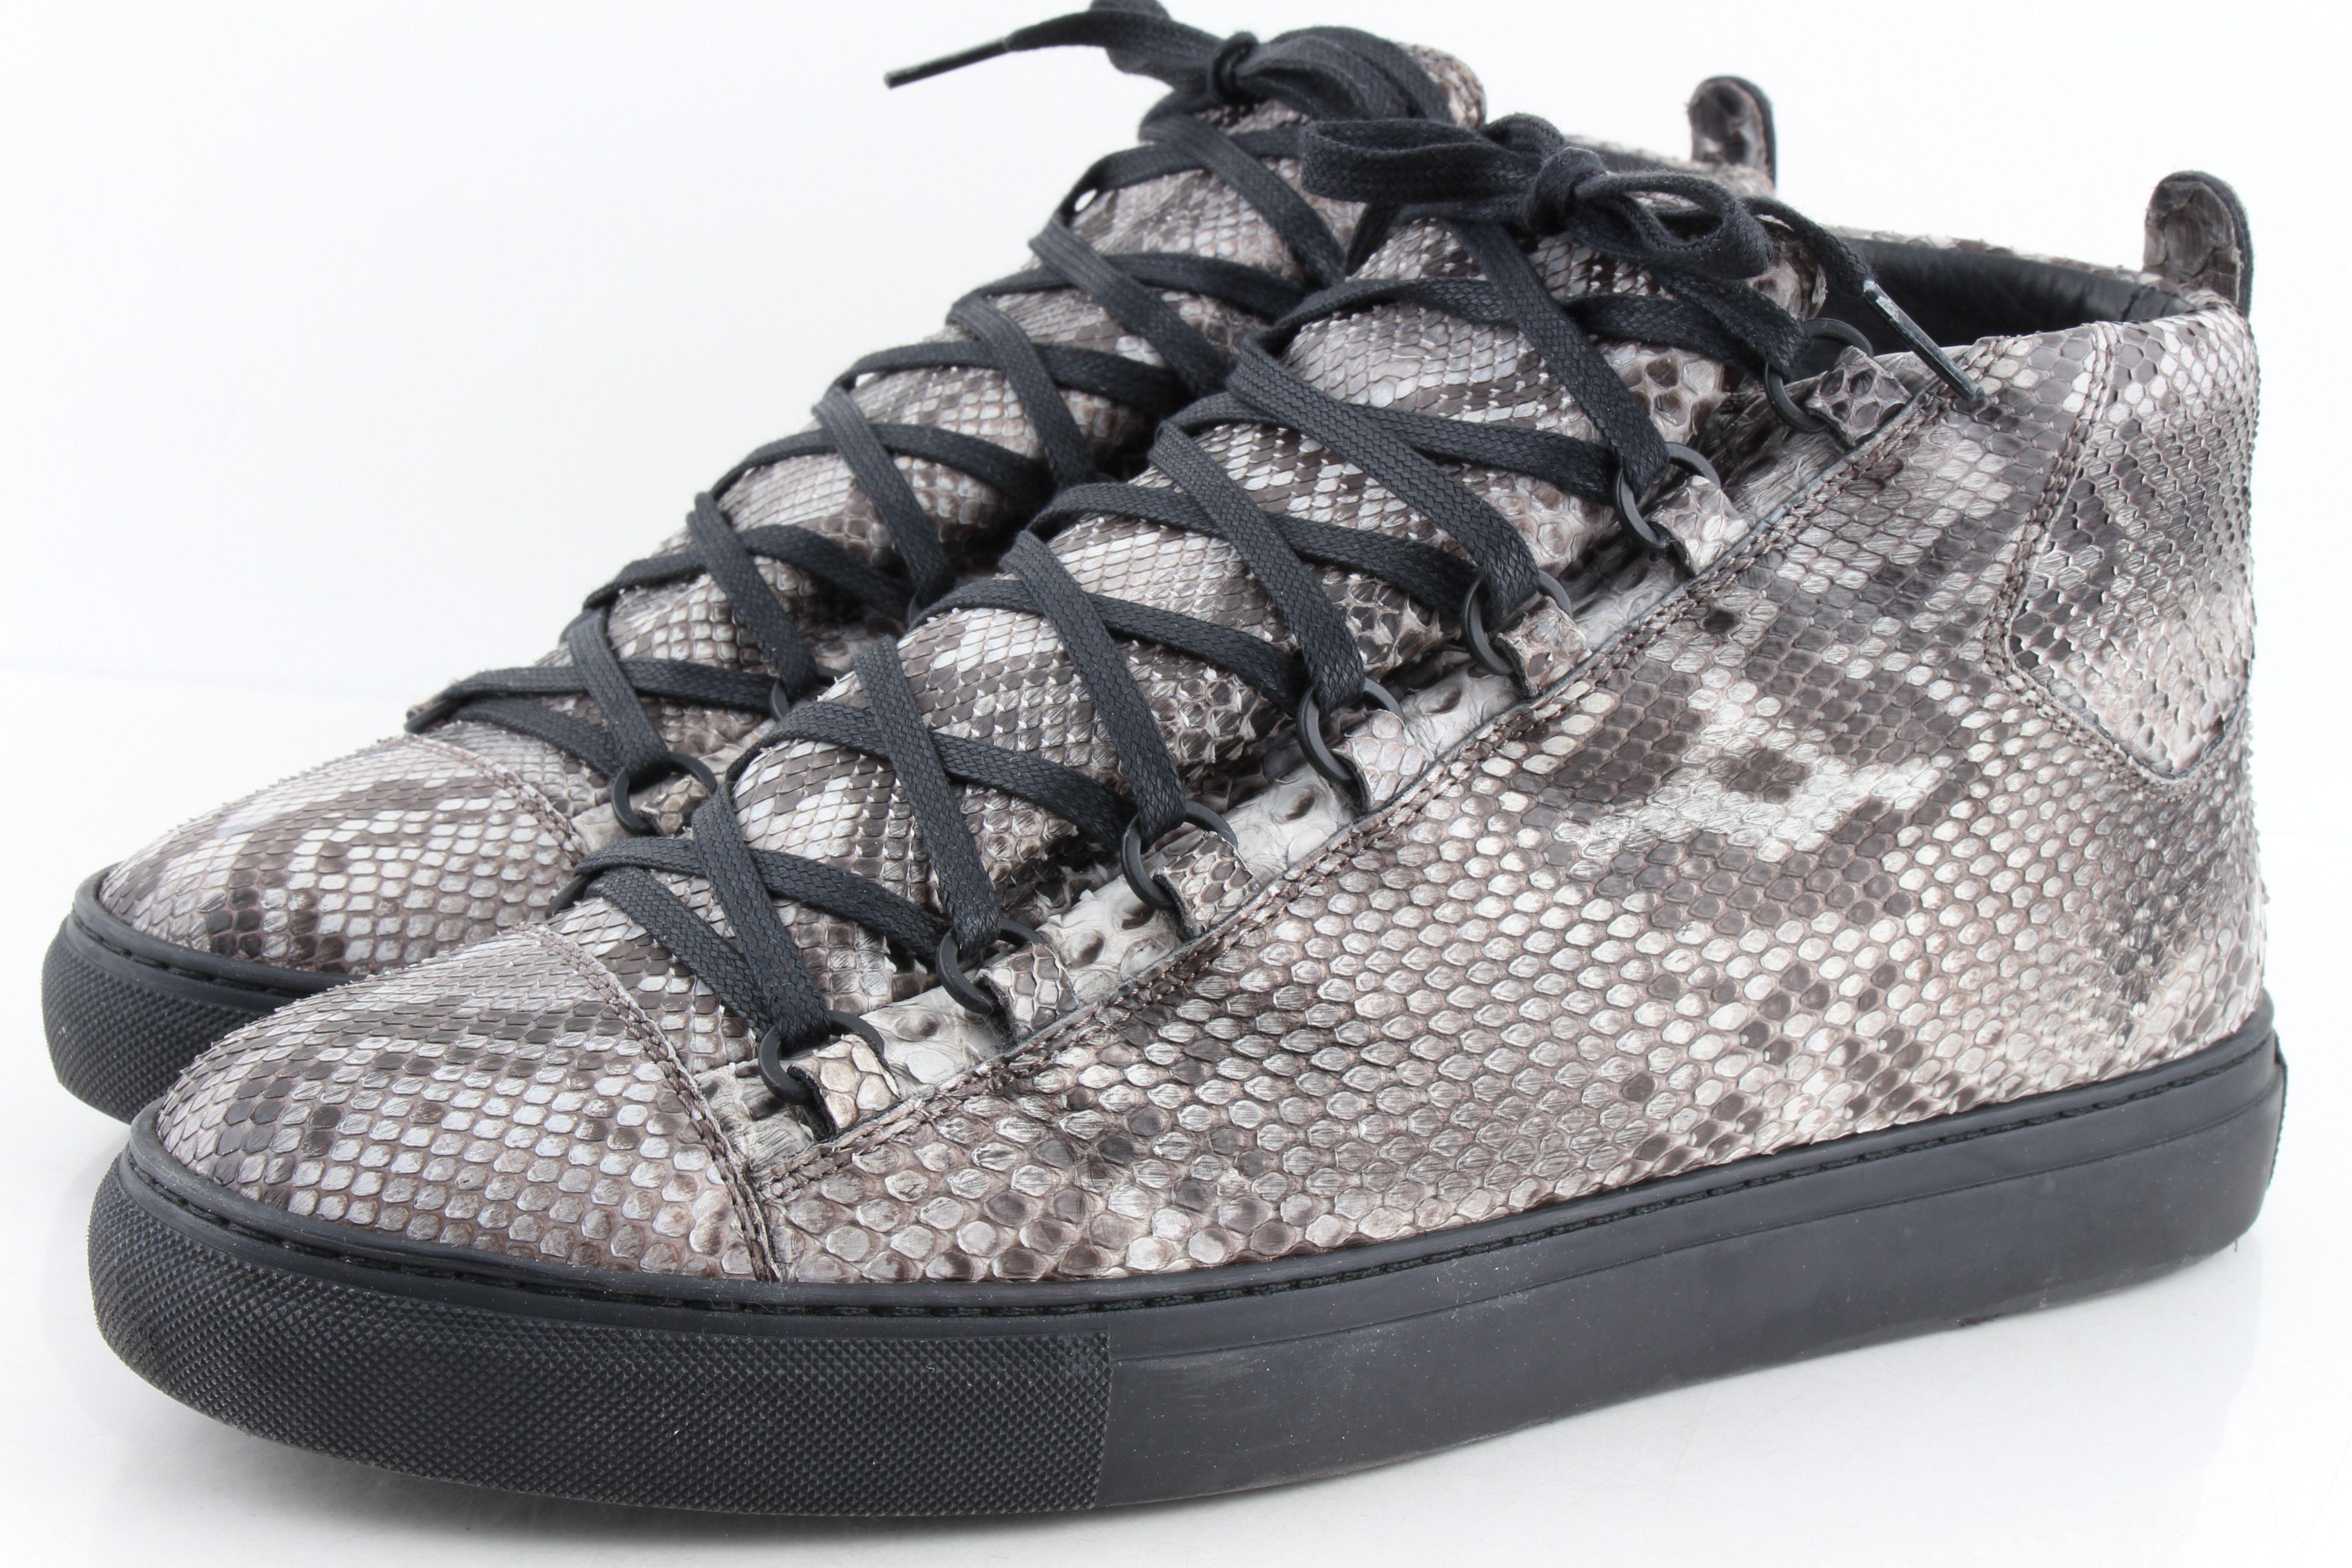 Python Arena High-top Sneakers | LePrix